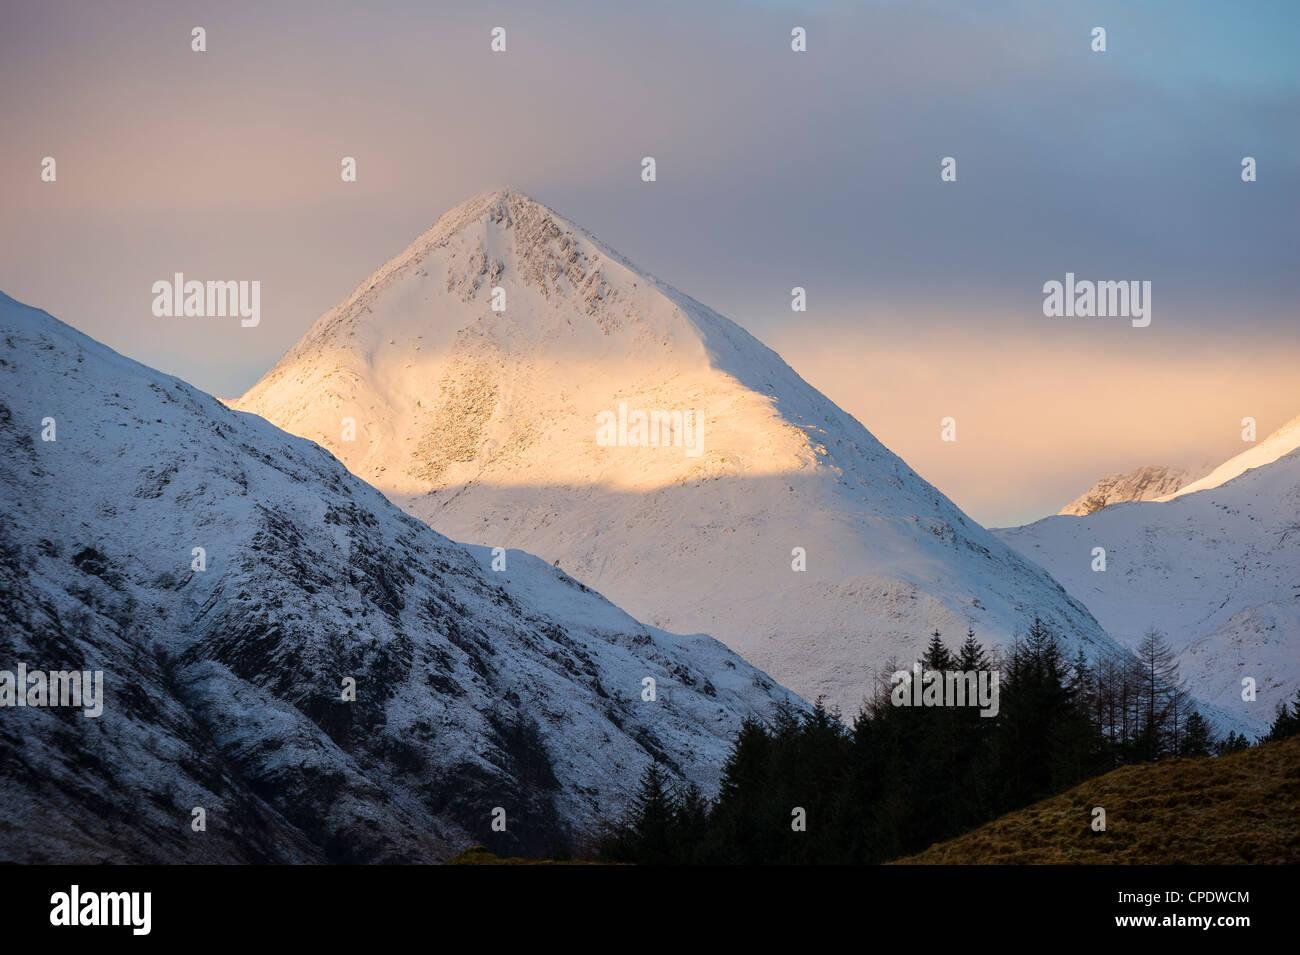 Shaft of golden sunlight on a snowy covered mountain, Glen Sheil, Highlands, Scotland, UK Stock Photo